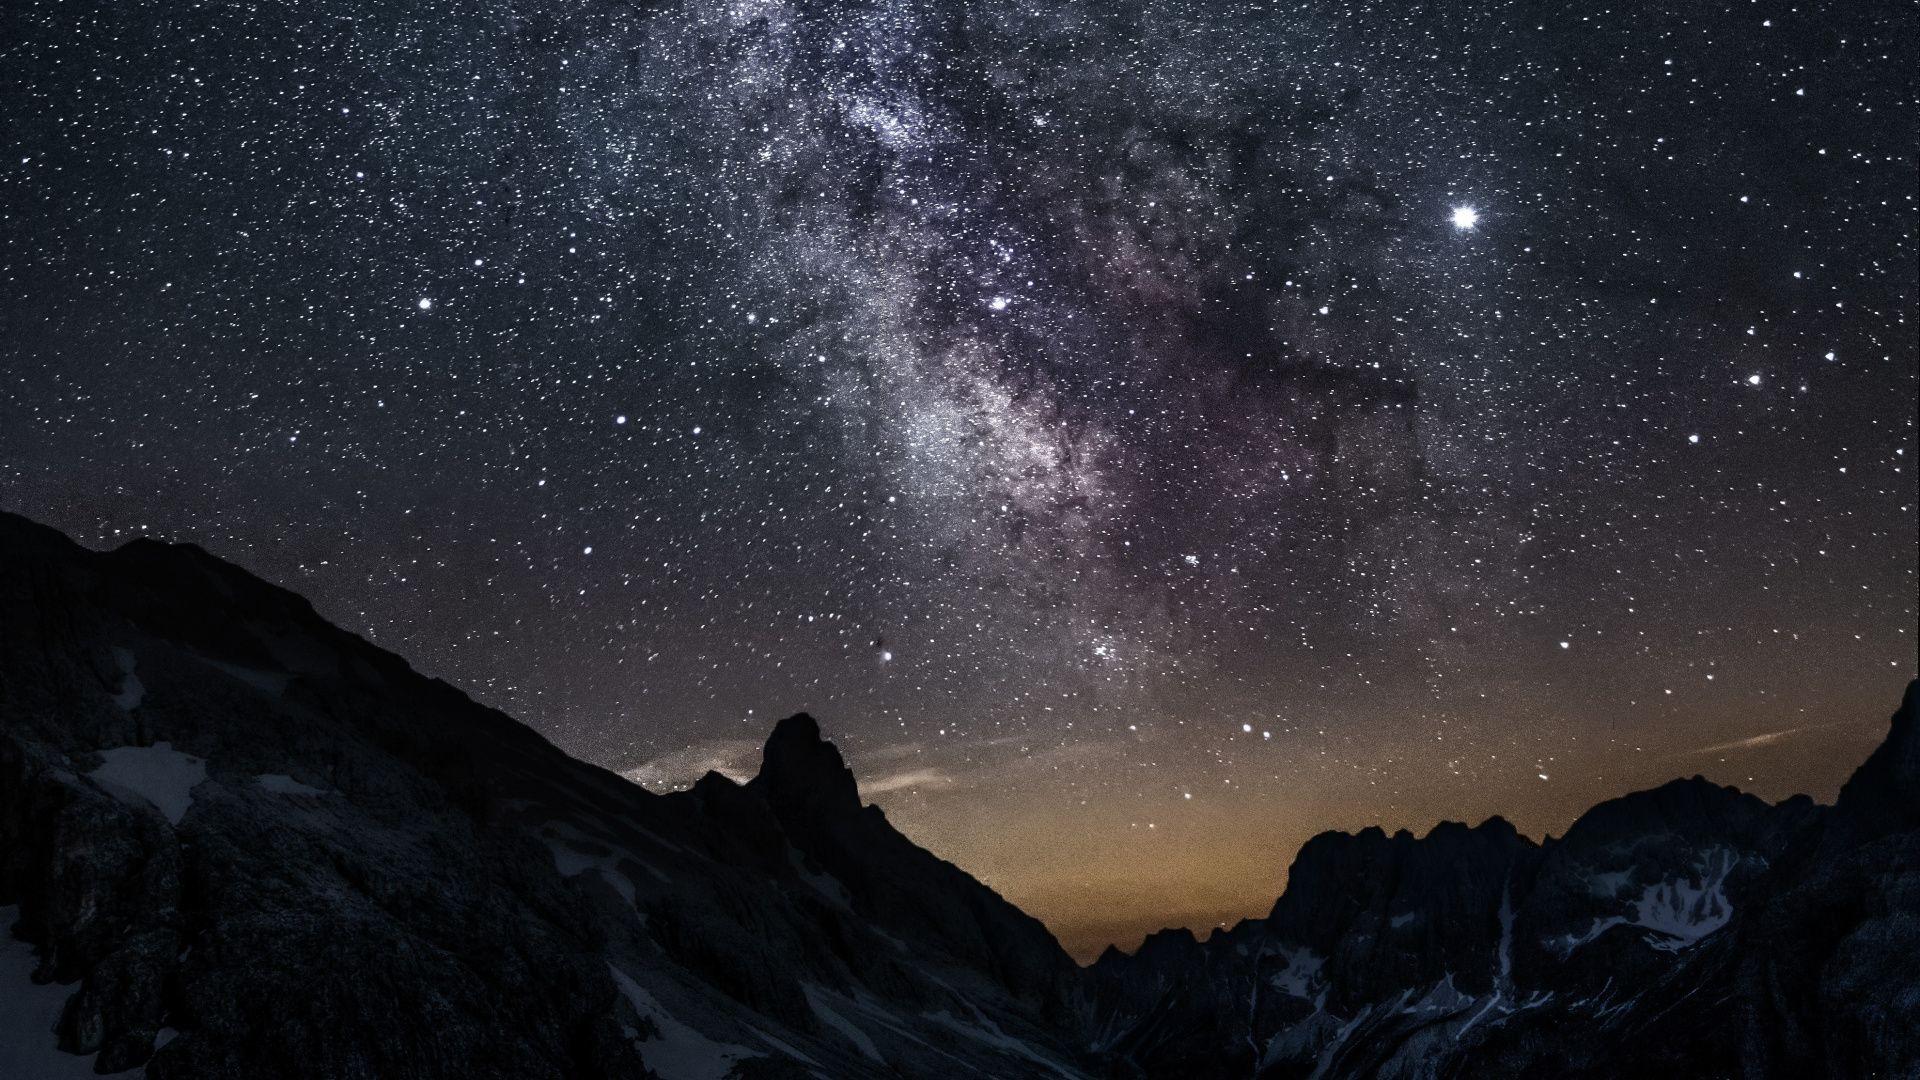 1920x1080 Valley Mountain Night Starry Sky Wallpaper Sky Wallpaper Wallpaper Watercolor Wallpaper Iphone